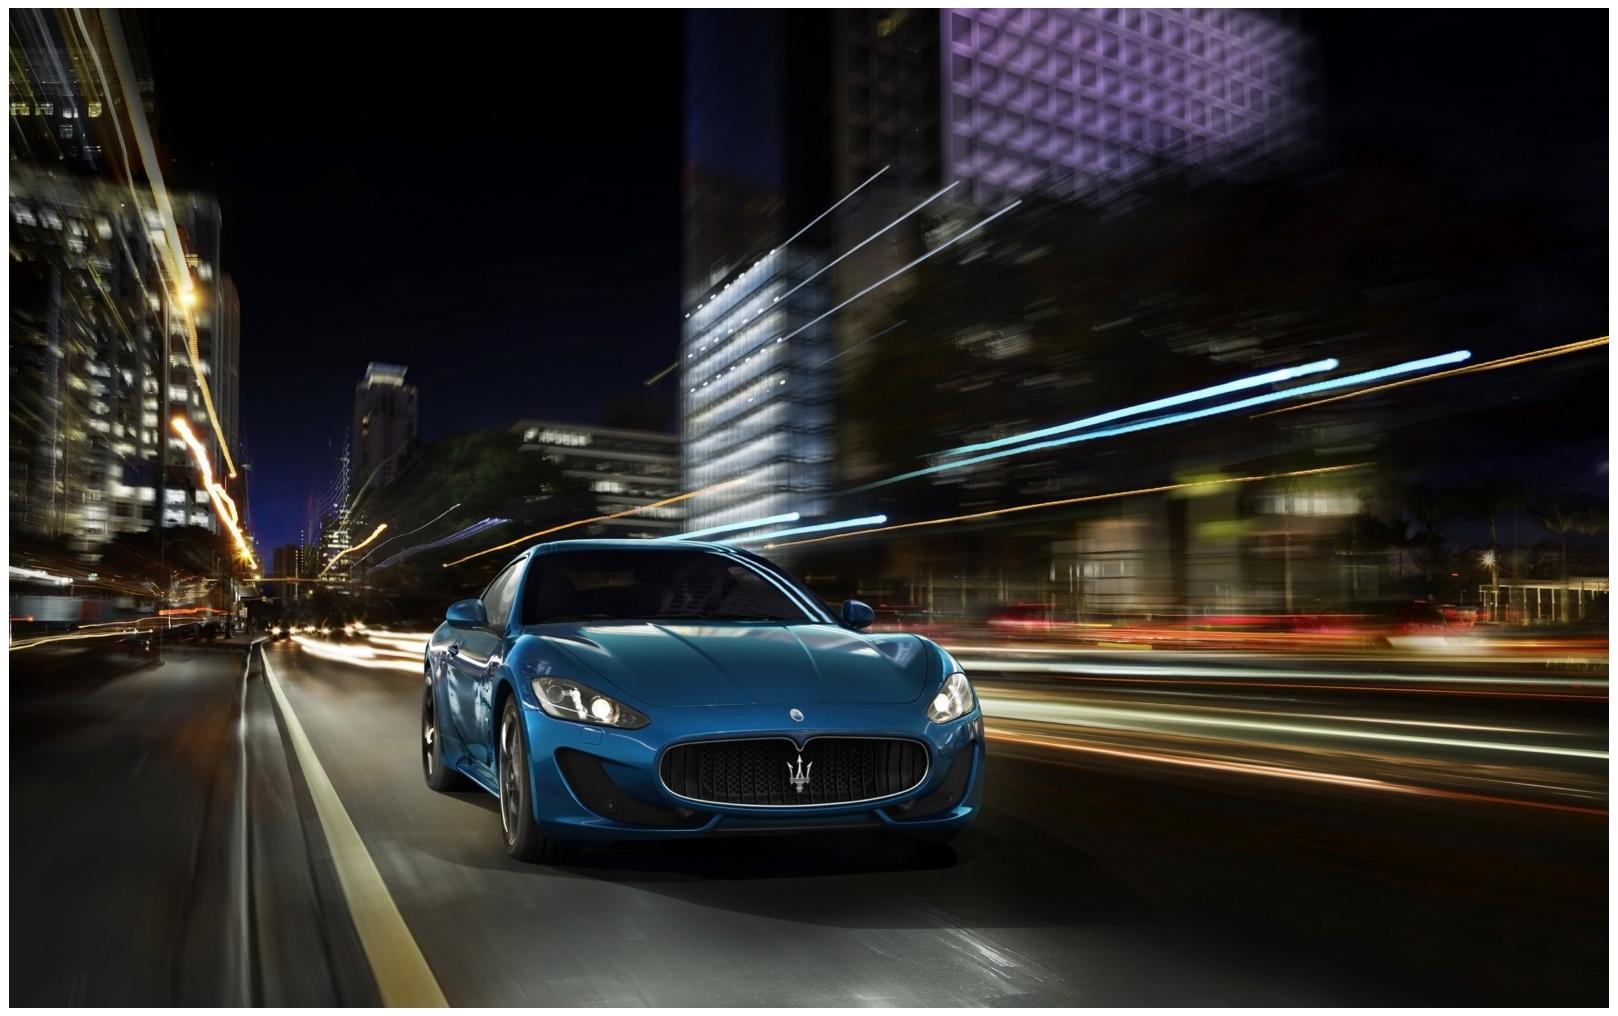 Best Islamic Hd Wallpapers For Desktop New Maserati Granturismo Hd Car Wallpaper Hd Walls